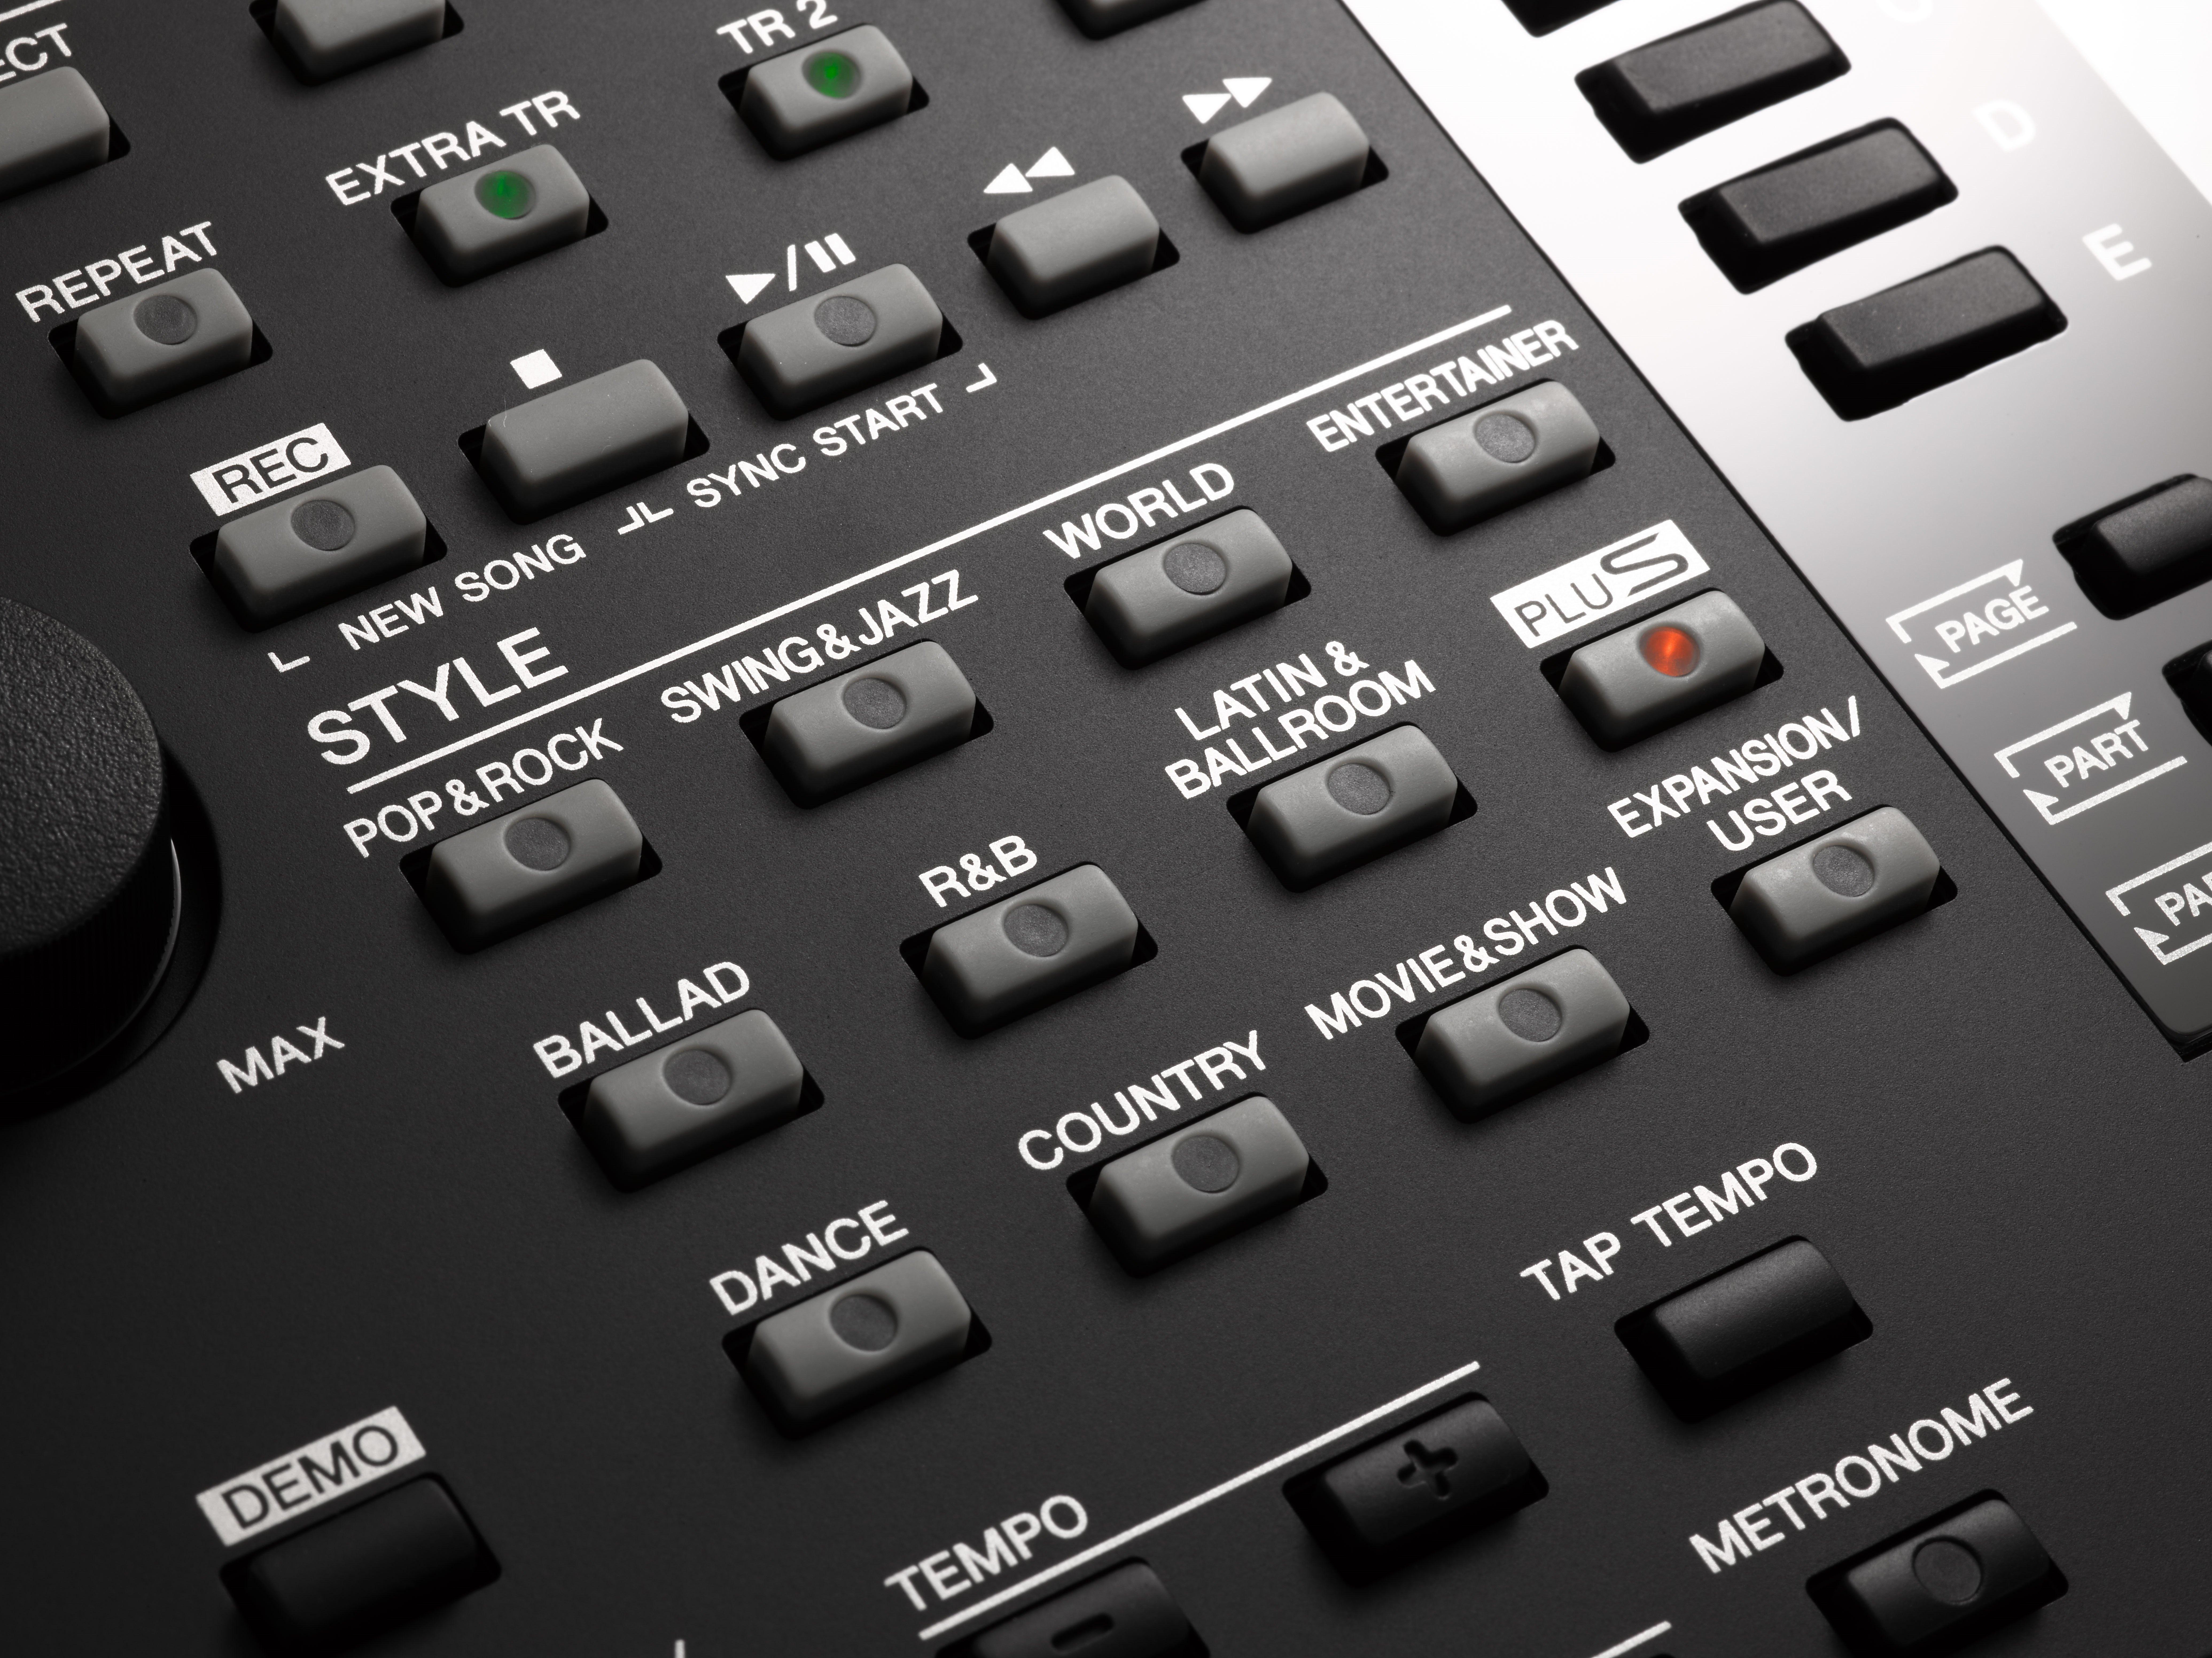 PSR S775 Professional 10,000 Styles and Midis USB plug and play